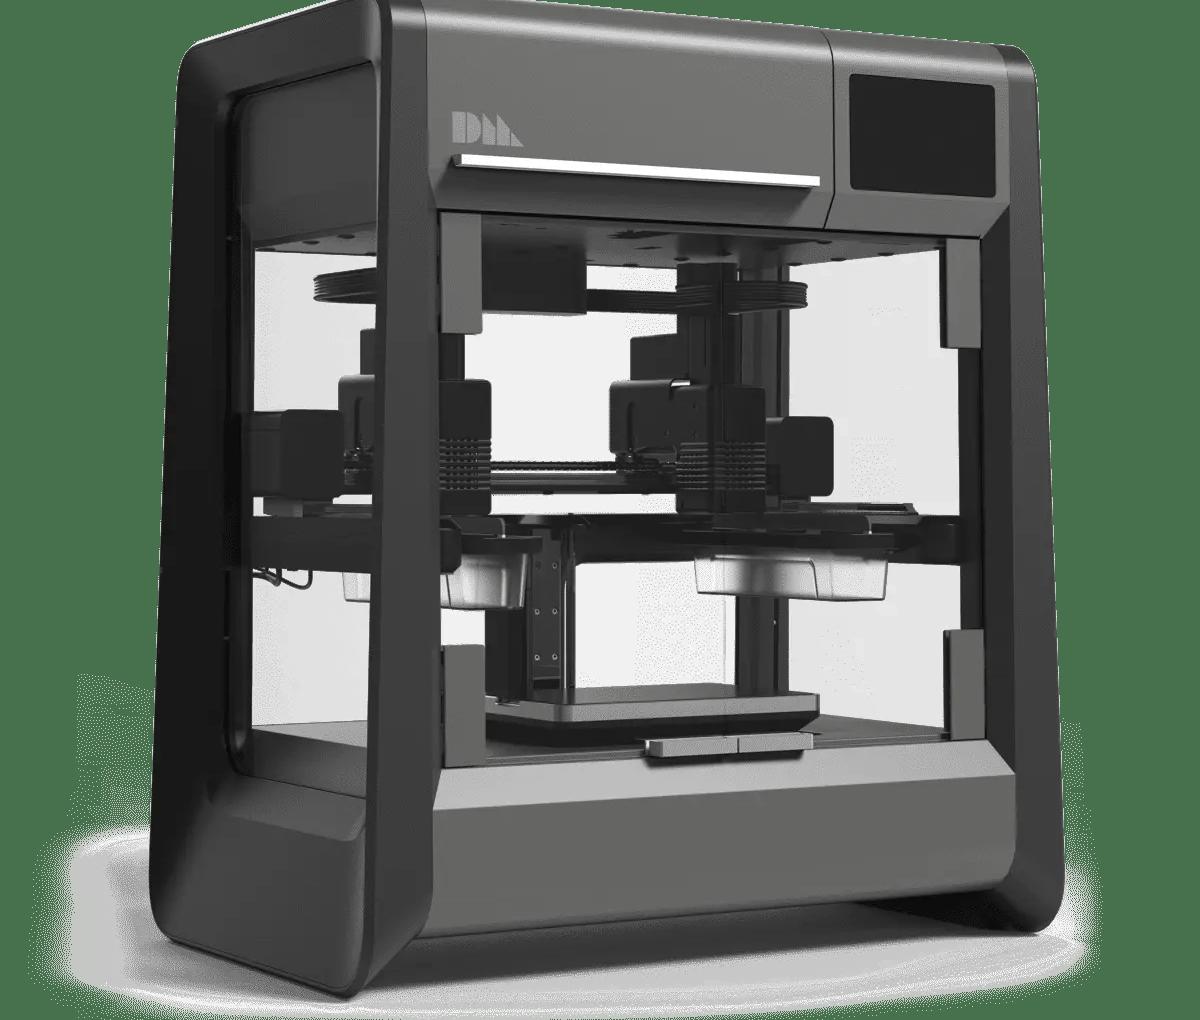 Makerbot Replicator Smart Extruder Plus